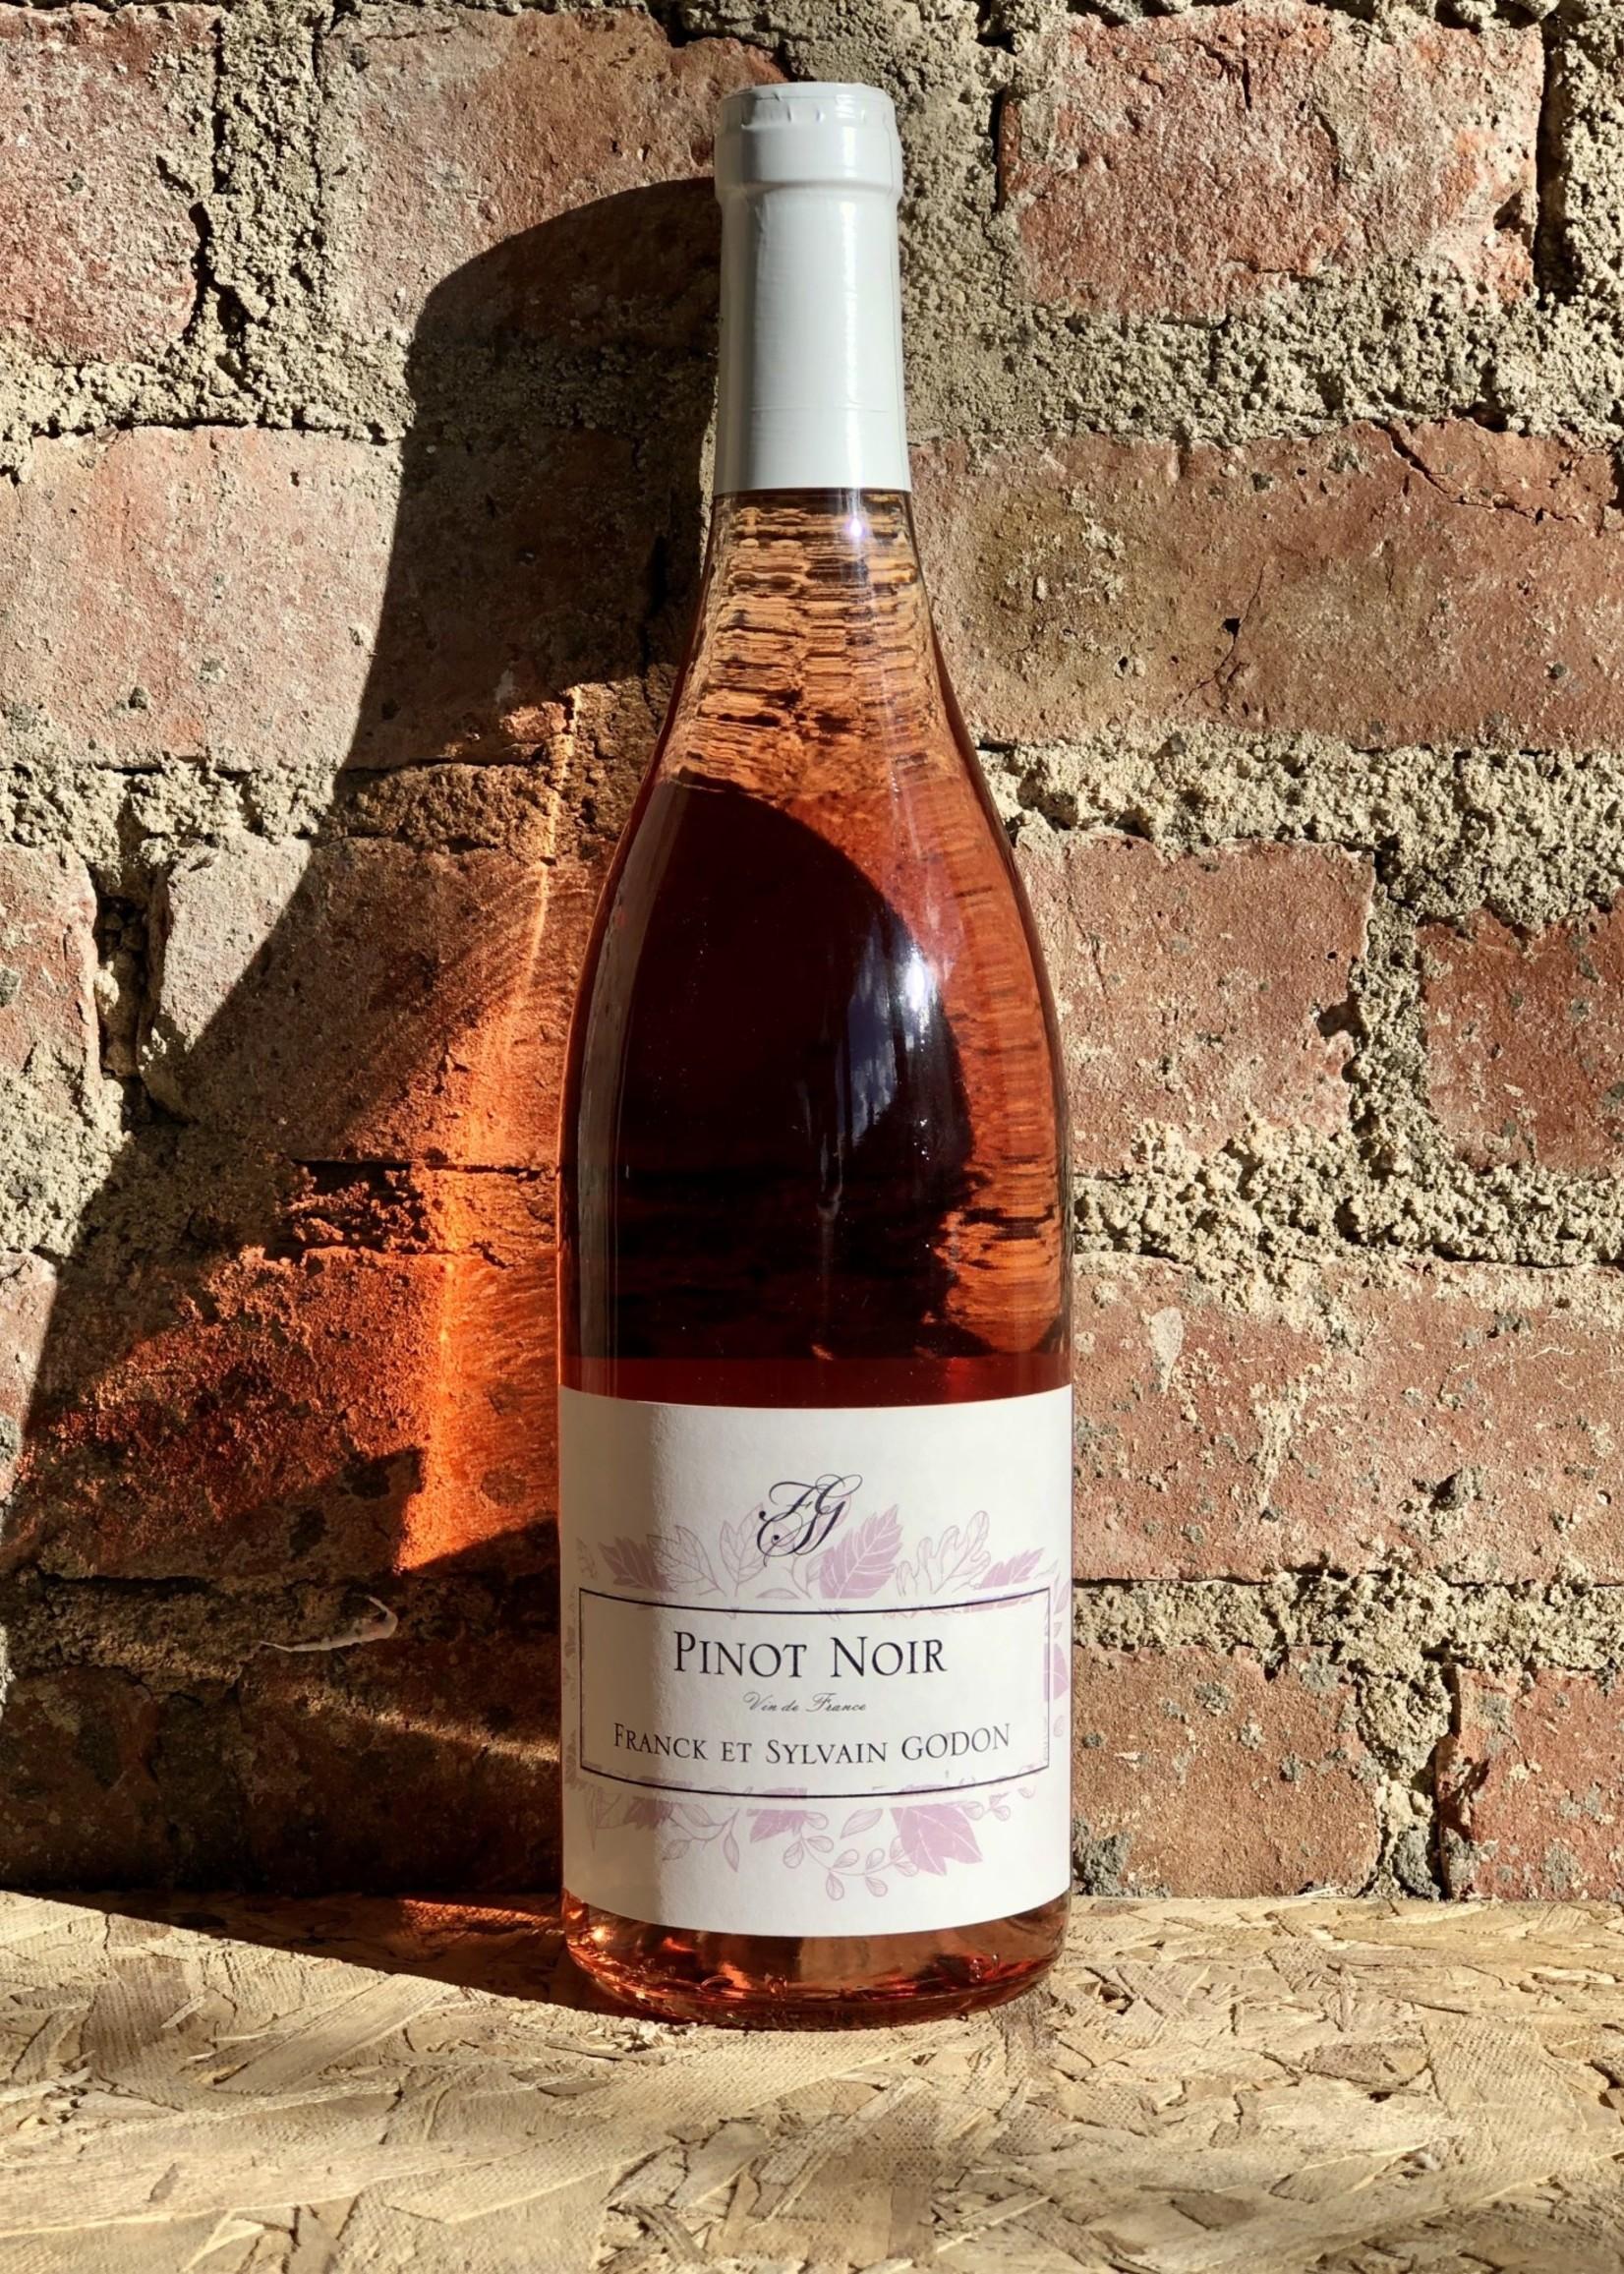 Franck & Sylvain Gordan Pinot Noir  Rosé 2019 (Vin de France) 2019